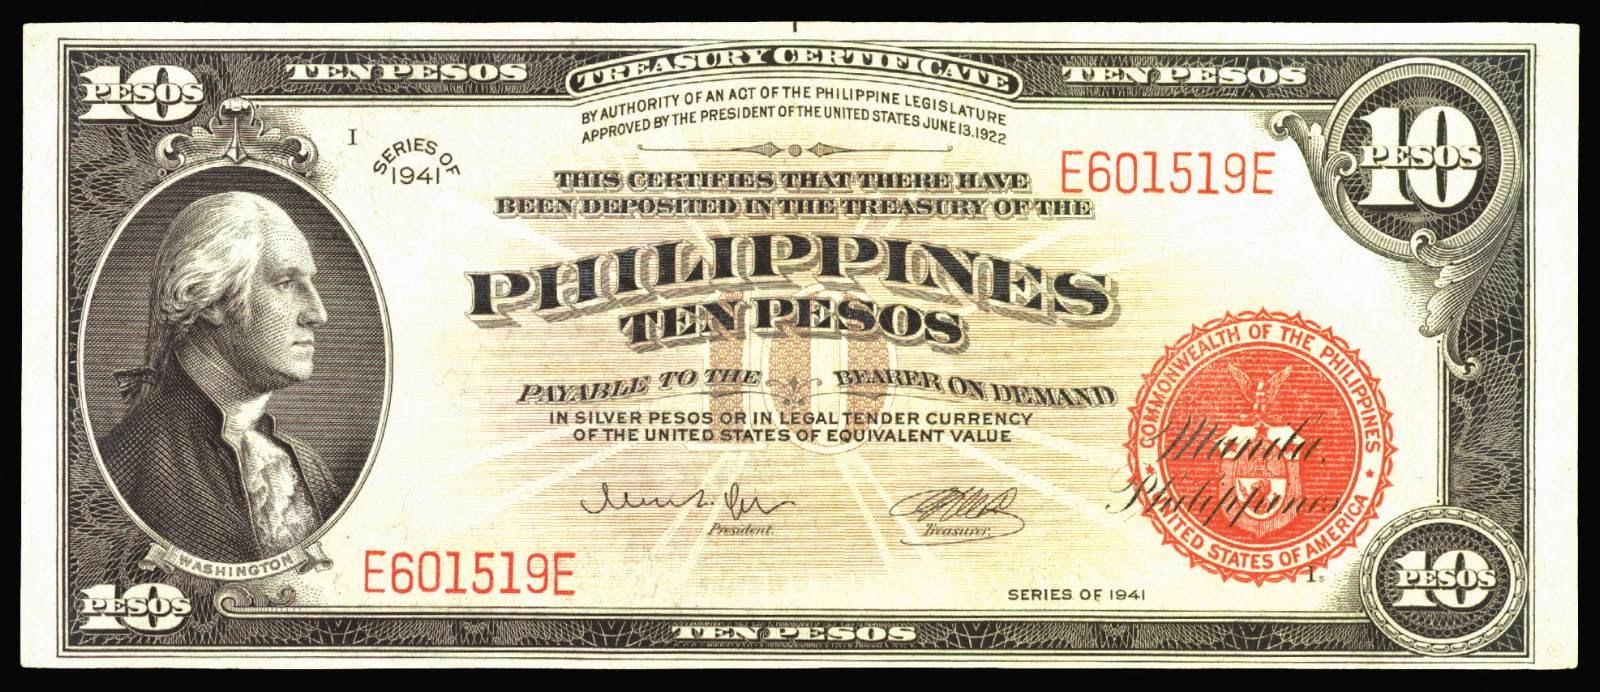 Philippines 10 Peso bill 1941 George Washington